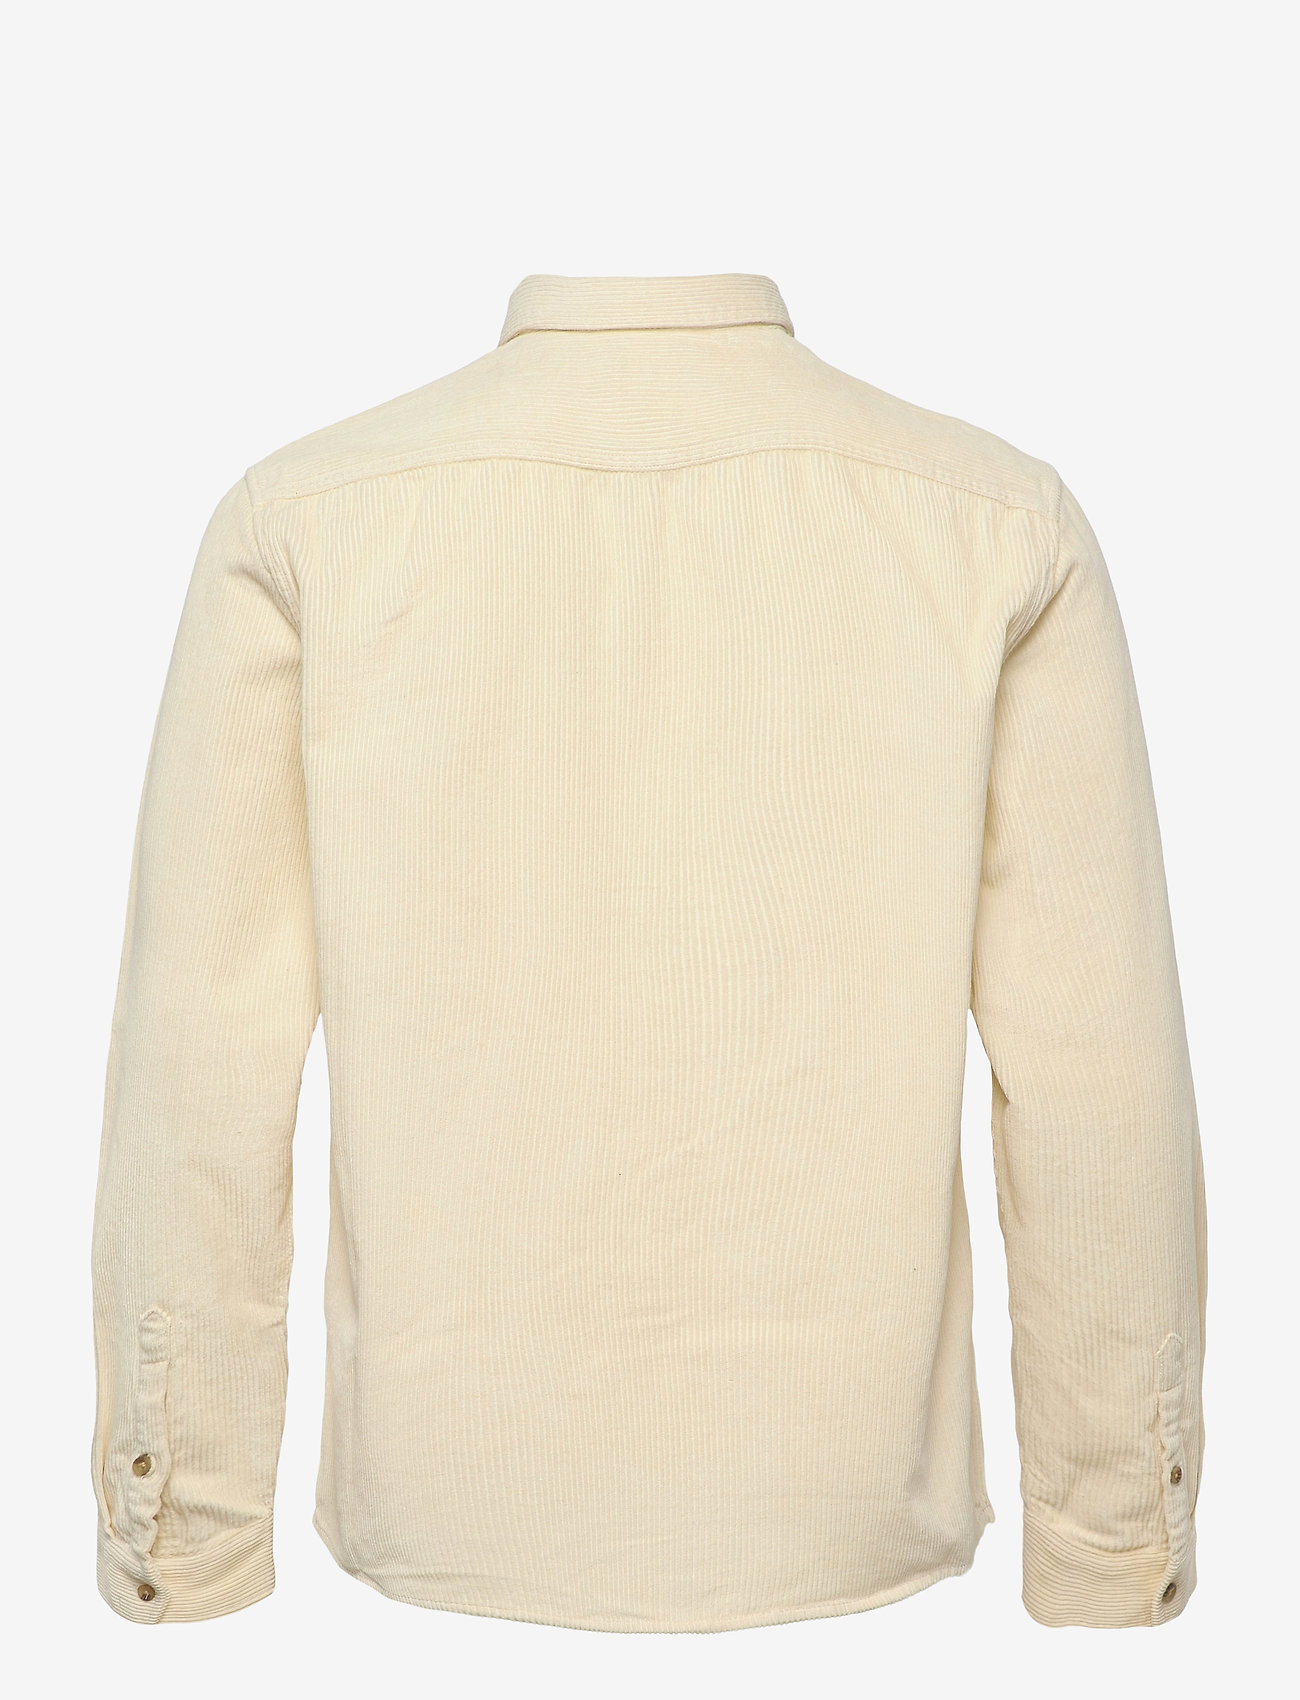 Esprit Casual - Shirts woven - hauts - cream beige - 1